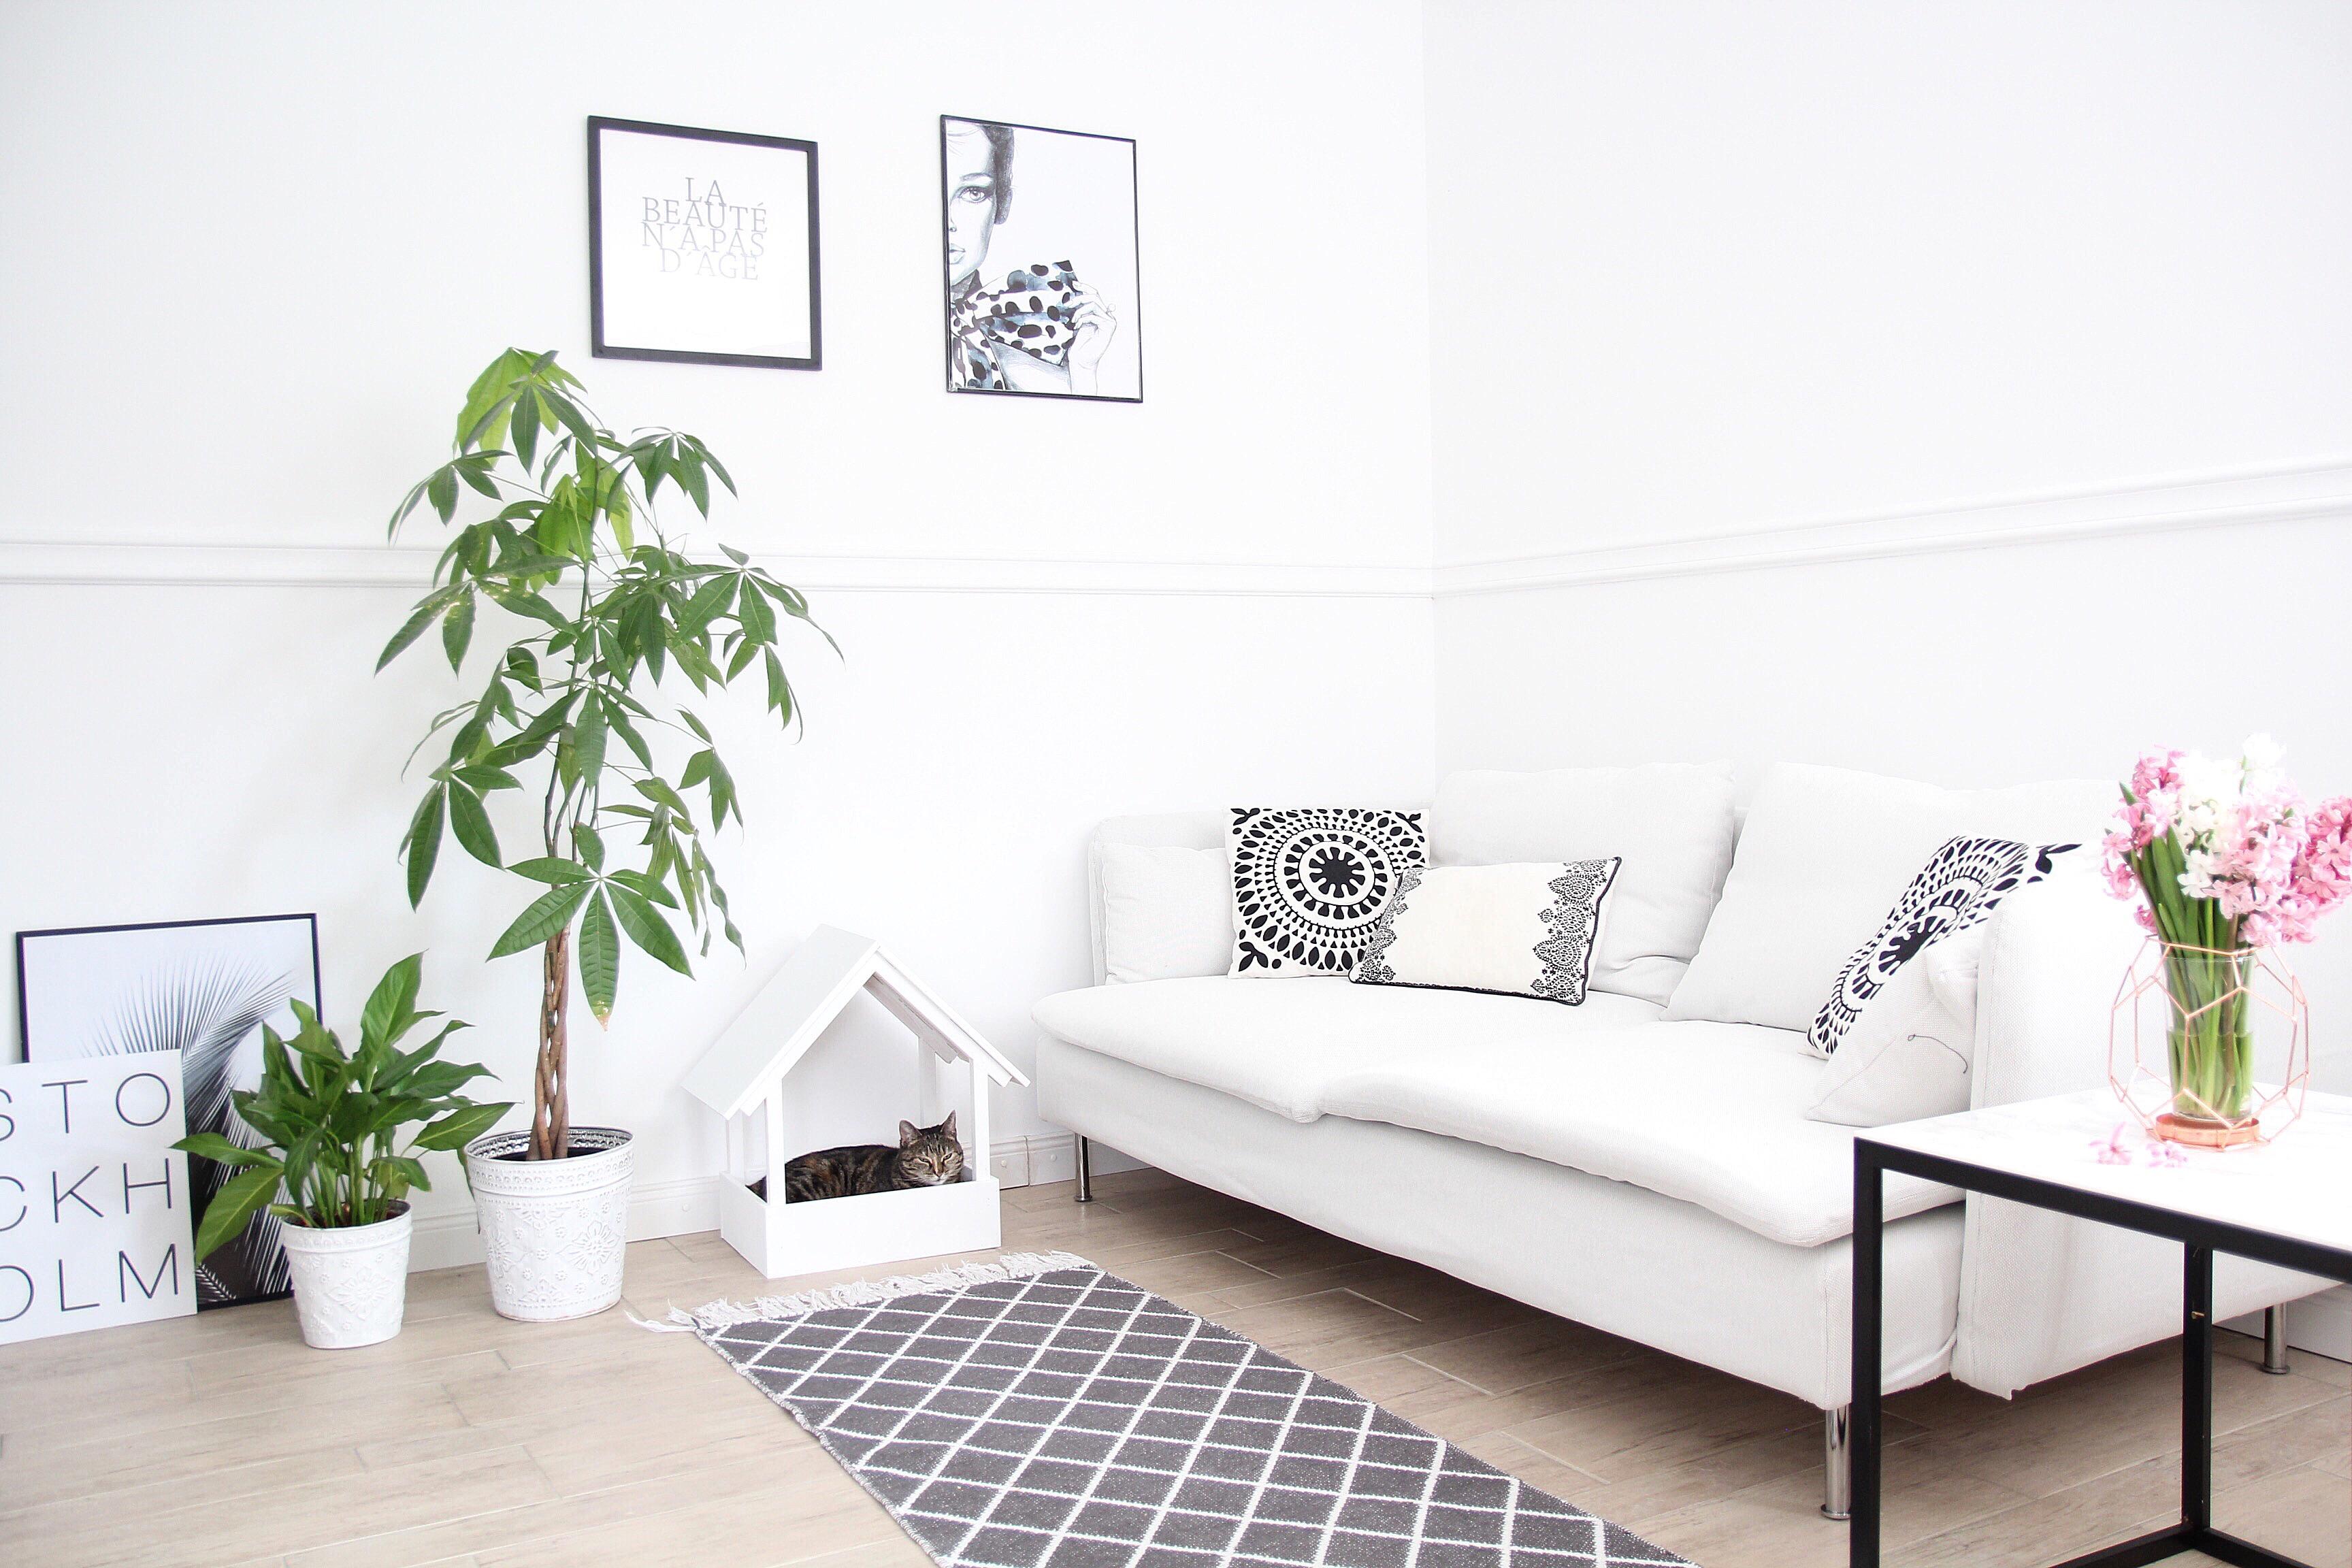 wandbett selber bauen amazing wandbett selber bauen with. Black Bedroom Furniture Sets. Home Design Ideas